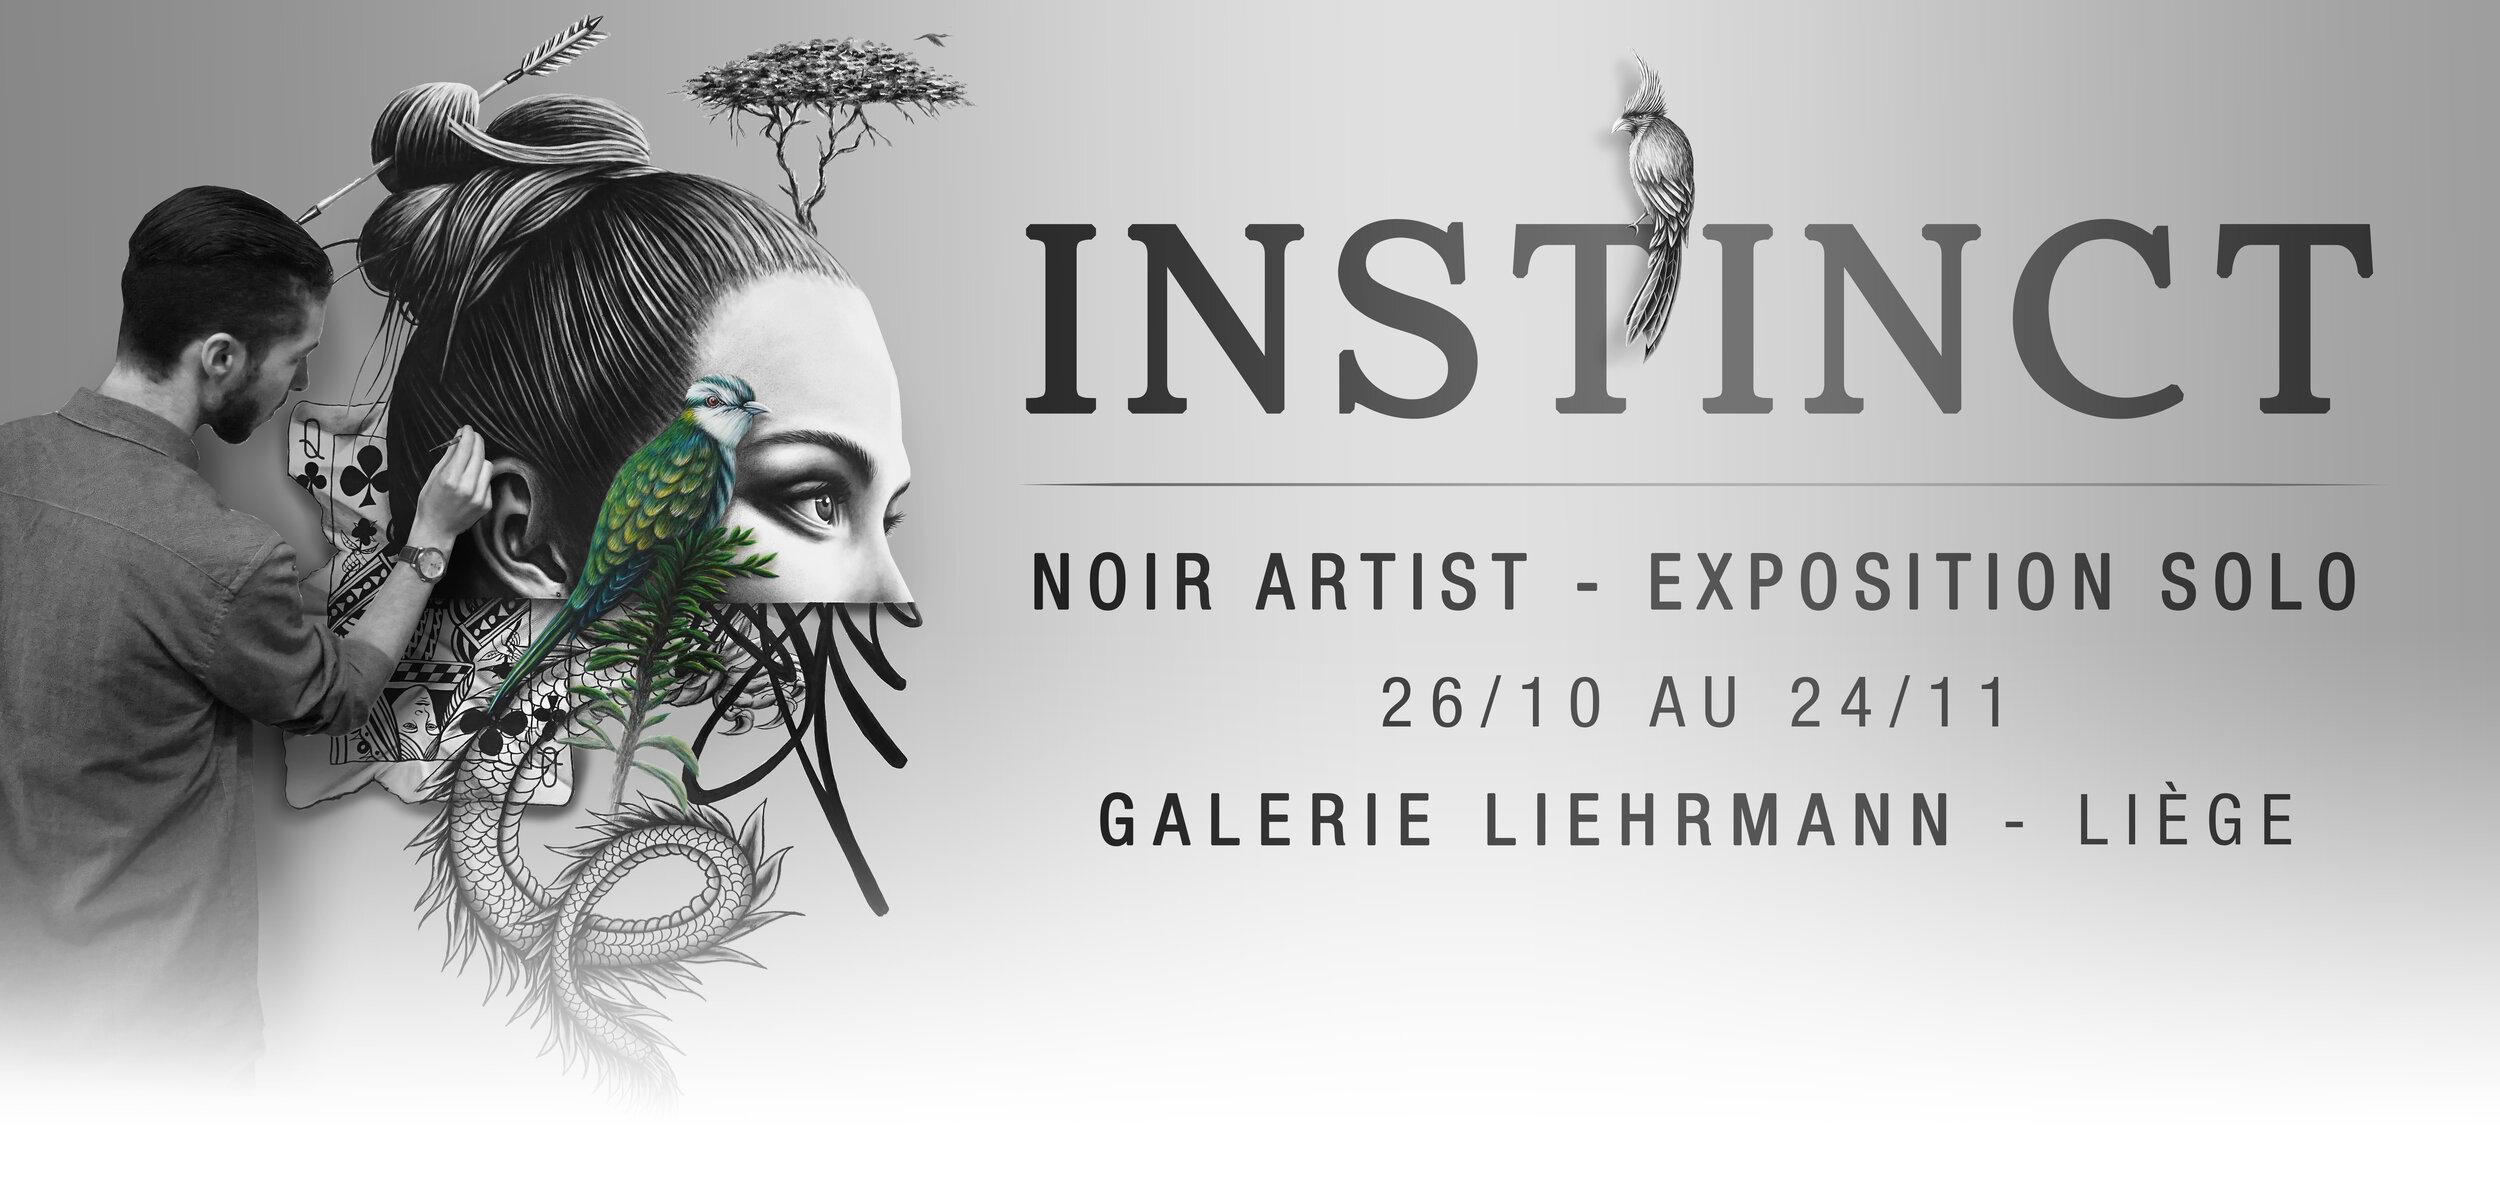 NOIR Expo Solo Instinct